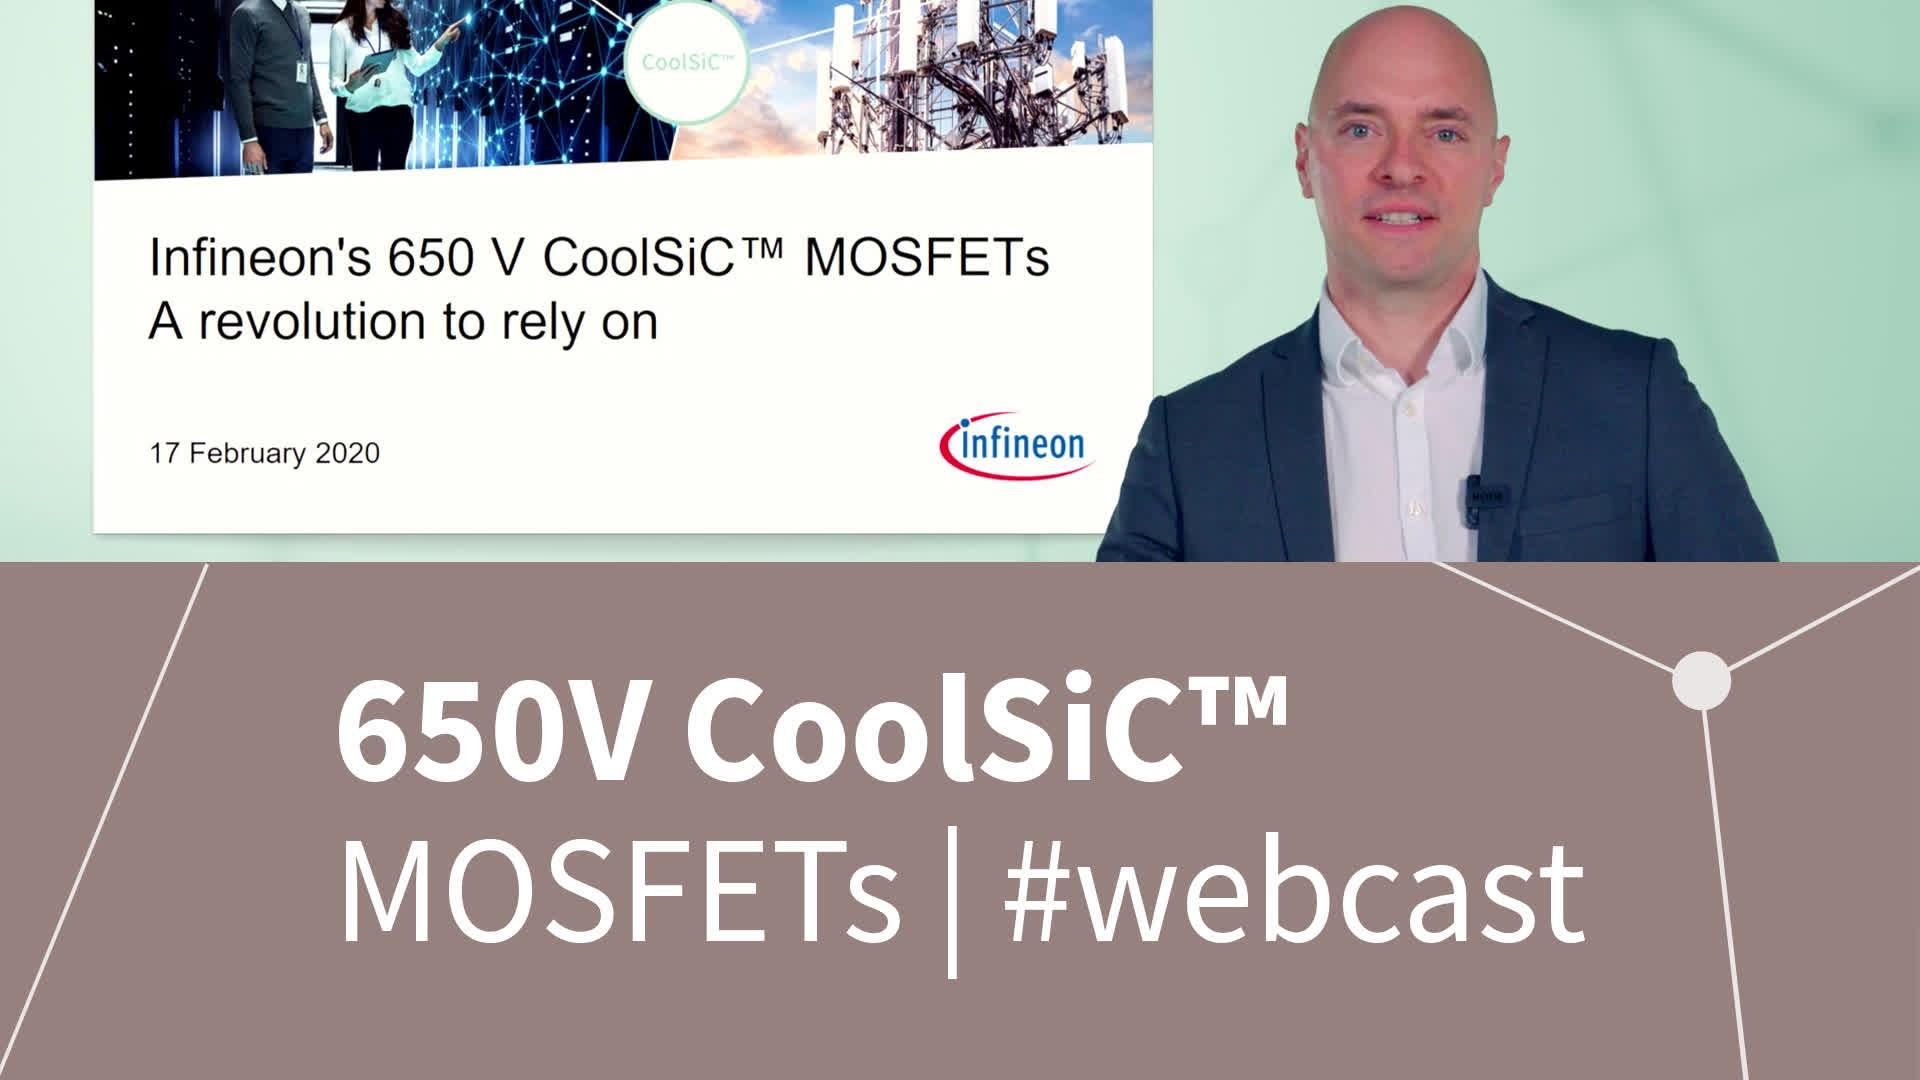 650 V CoolSiC™ MOSFETs